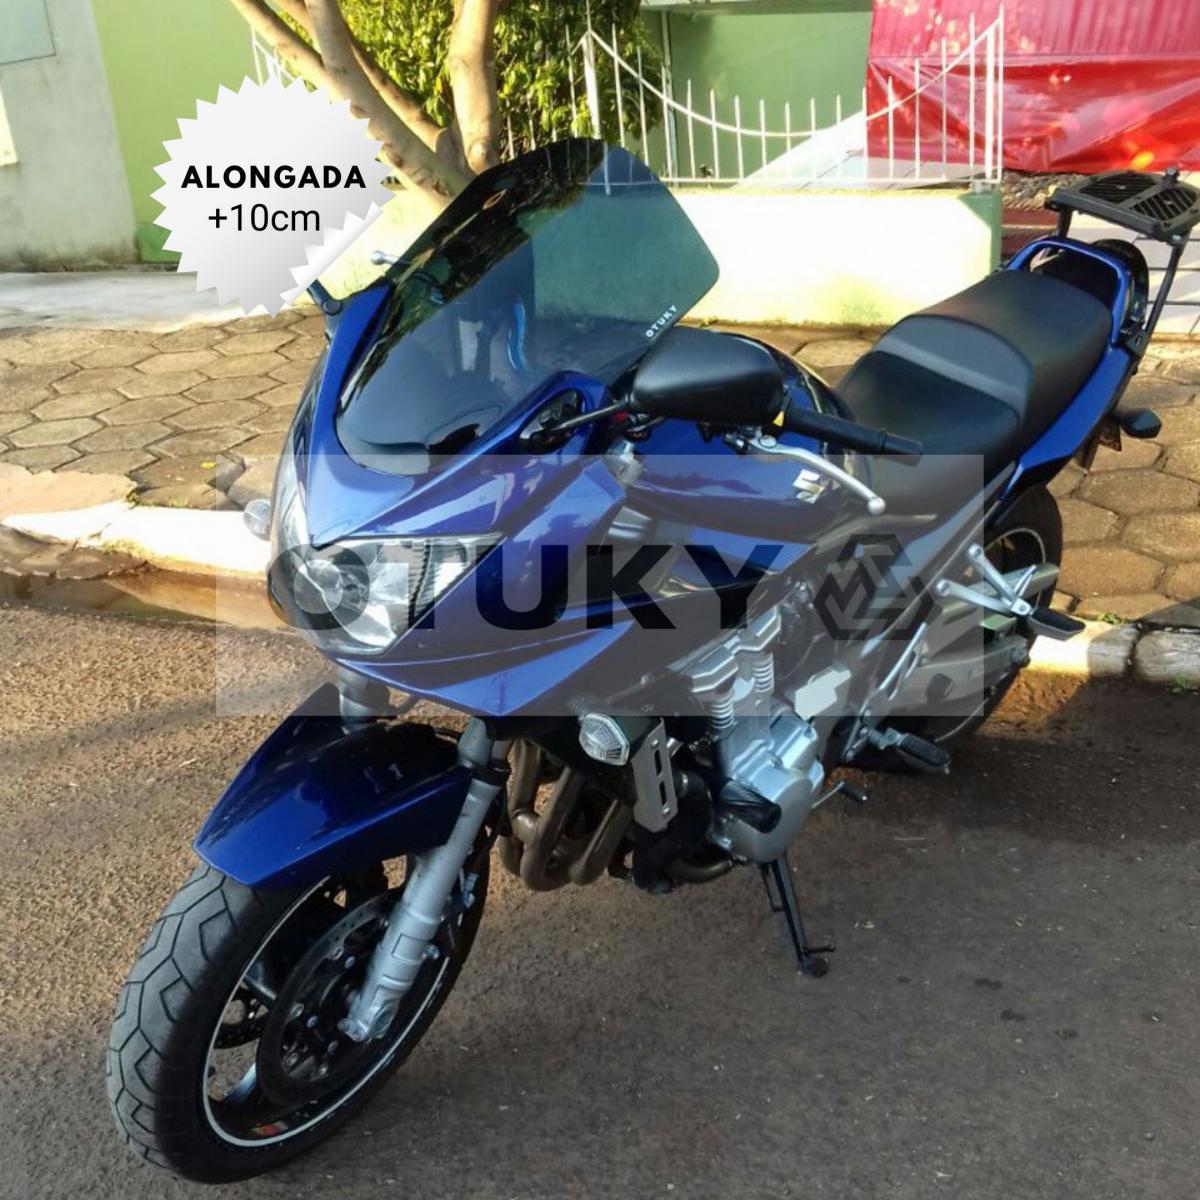 Bolha para Moto Bandit 1250 S 2009 2010 2011 2012 Alongada +10cm Otuky